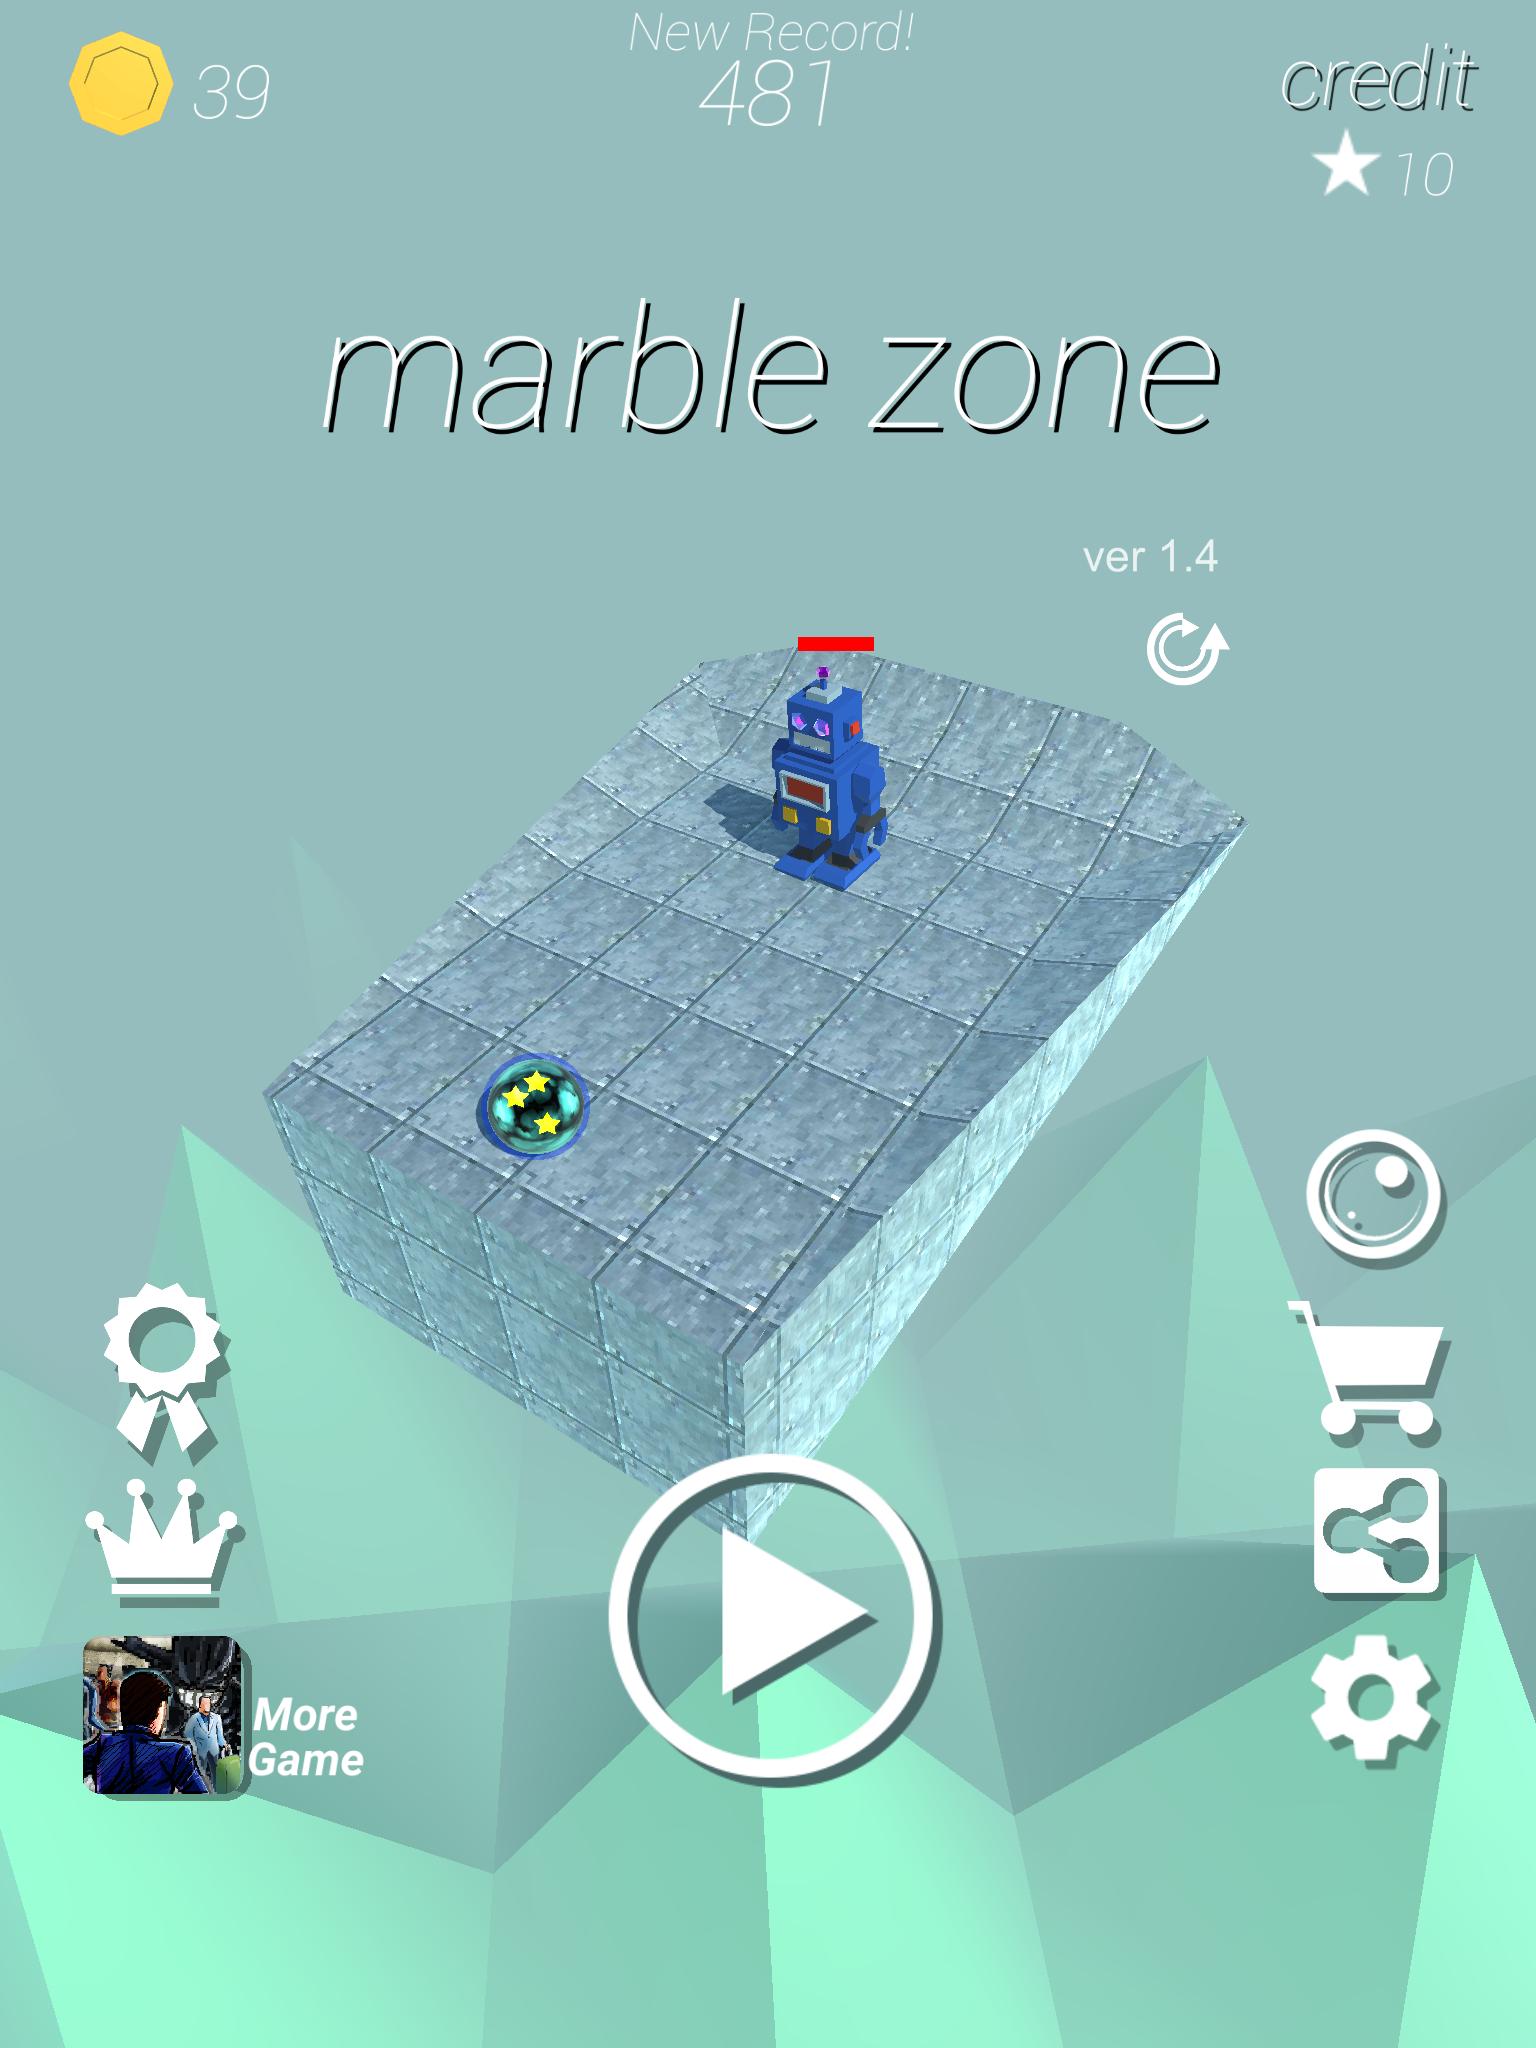 marbleZone pstore05 tab